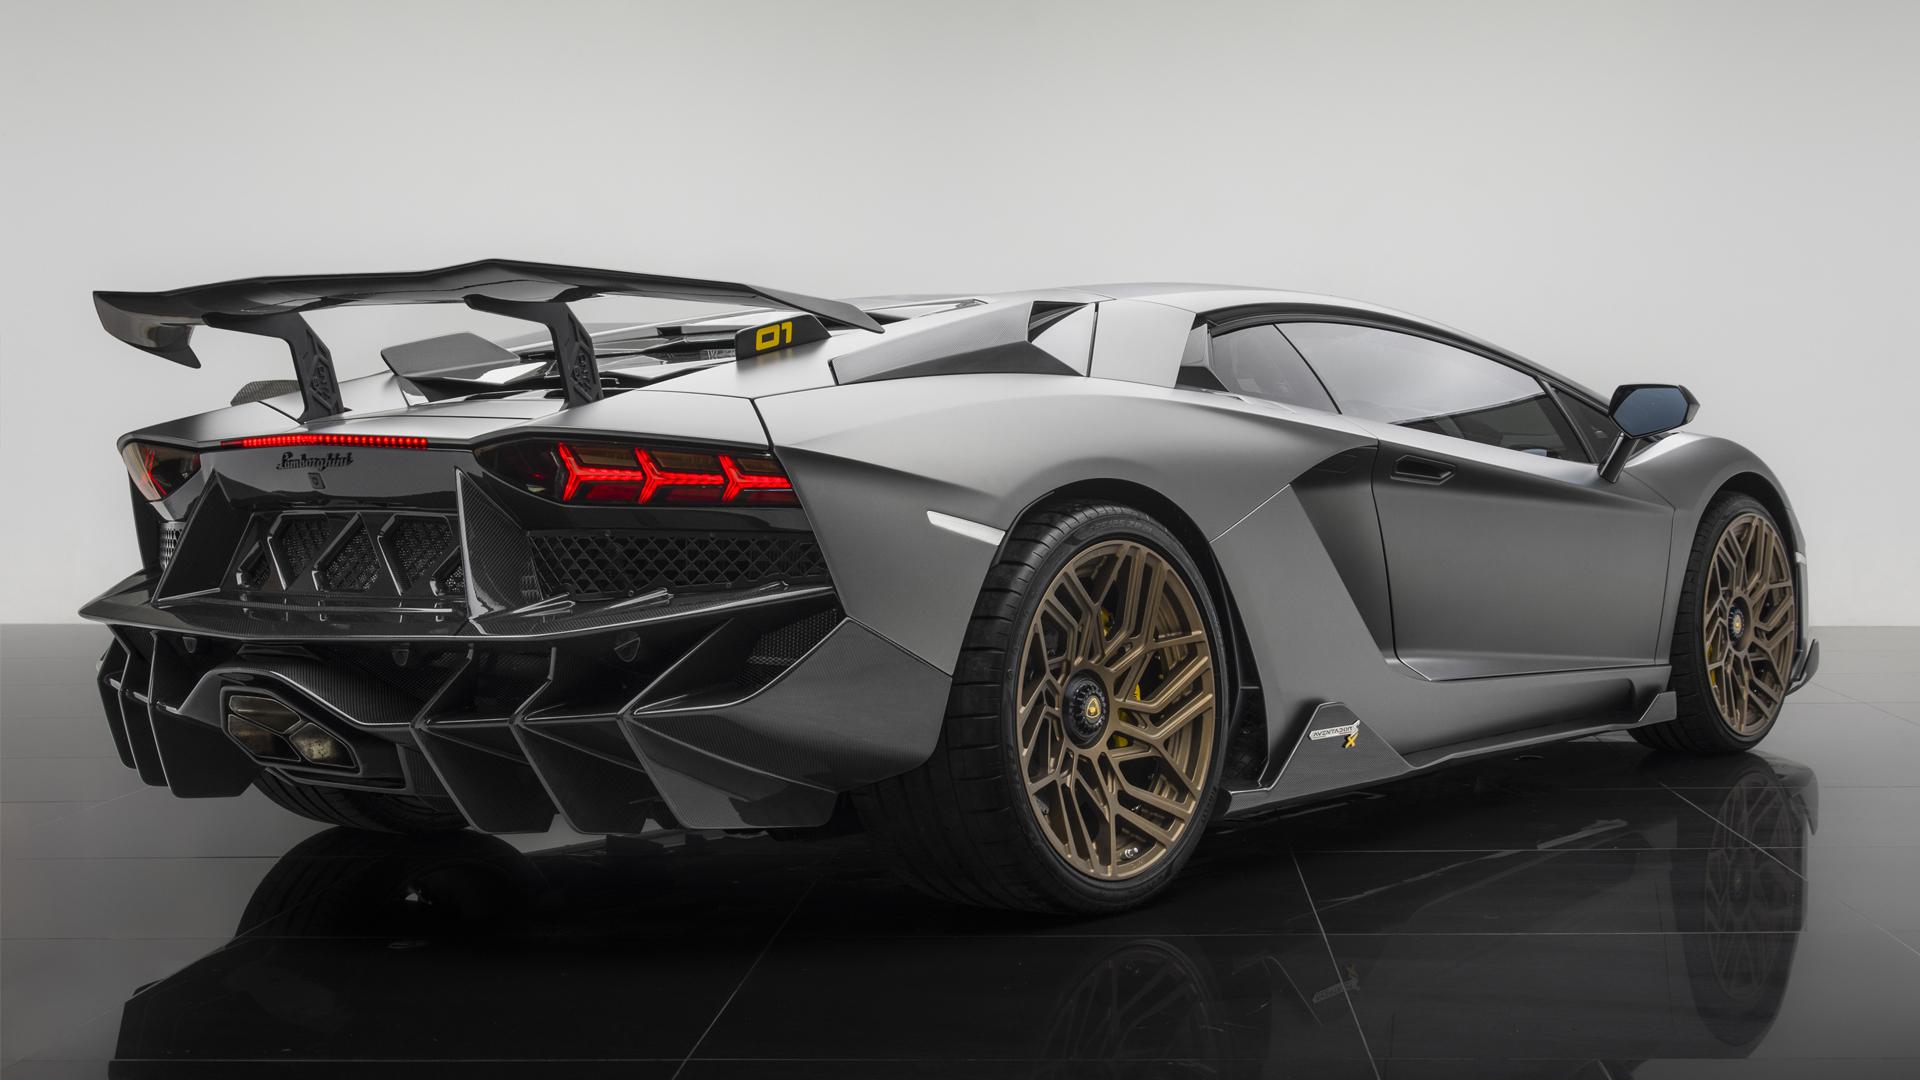 Lamborghini_Aventador_SX_by_Onyx_0004